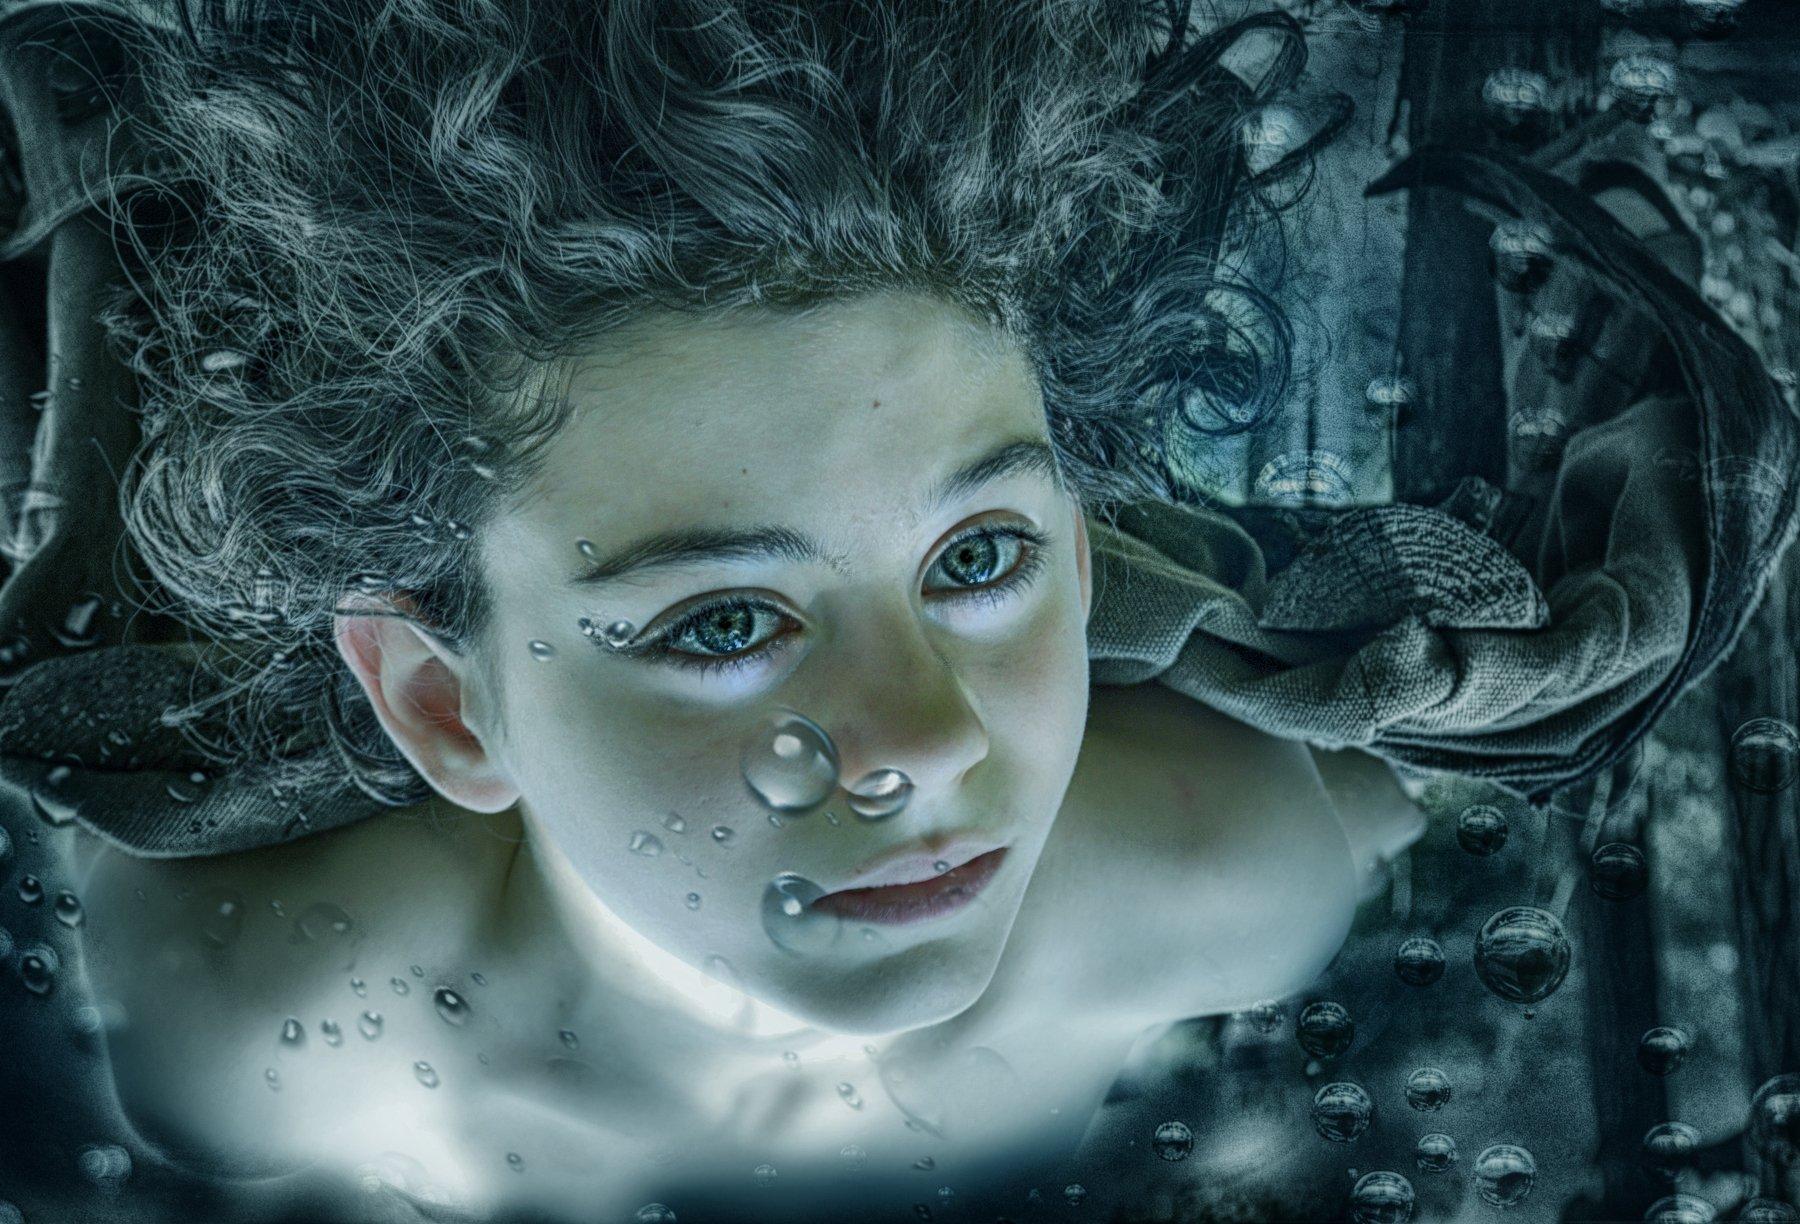 Aquamen,  Aqua, boy,  Head, Human, Face, Person, Outdoors, Nature, Water ,Photography ,Photo, Portrait ,Hair, Аквамен, Аква, мальчик, Человек, Лицо, Воды, Фотография, Фото, Портрет, Teodora Sarbinka